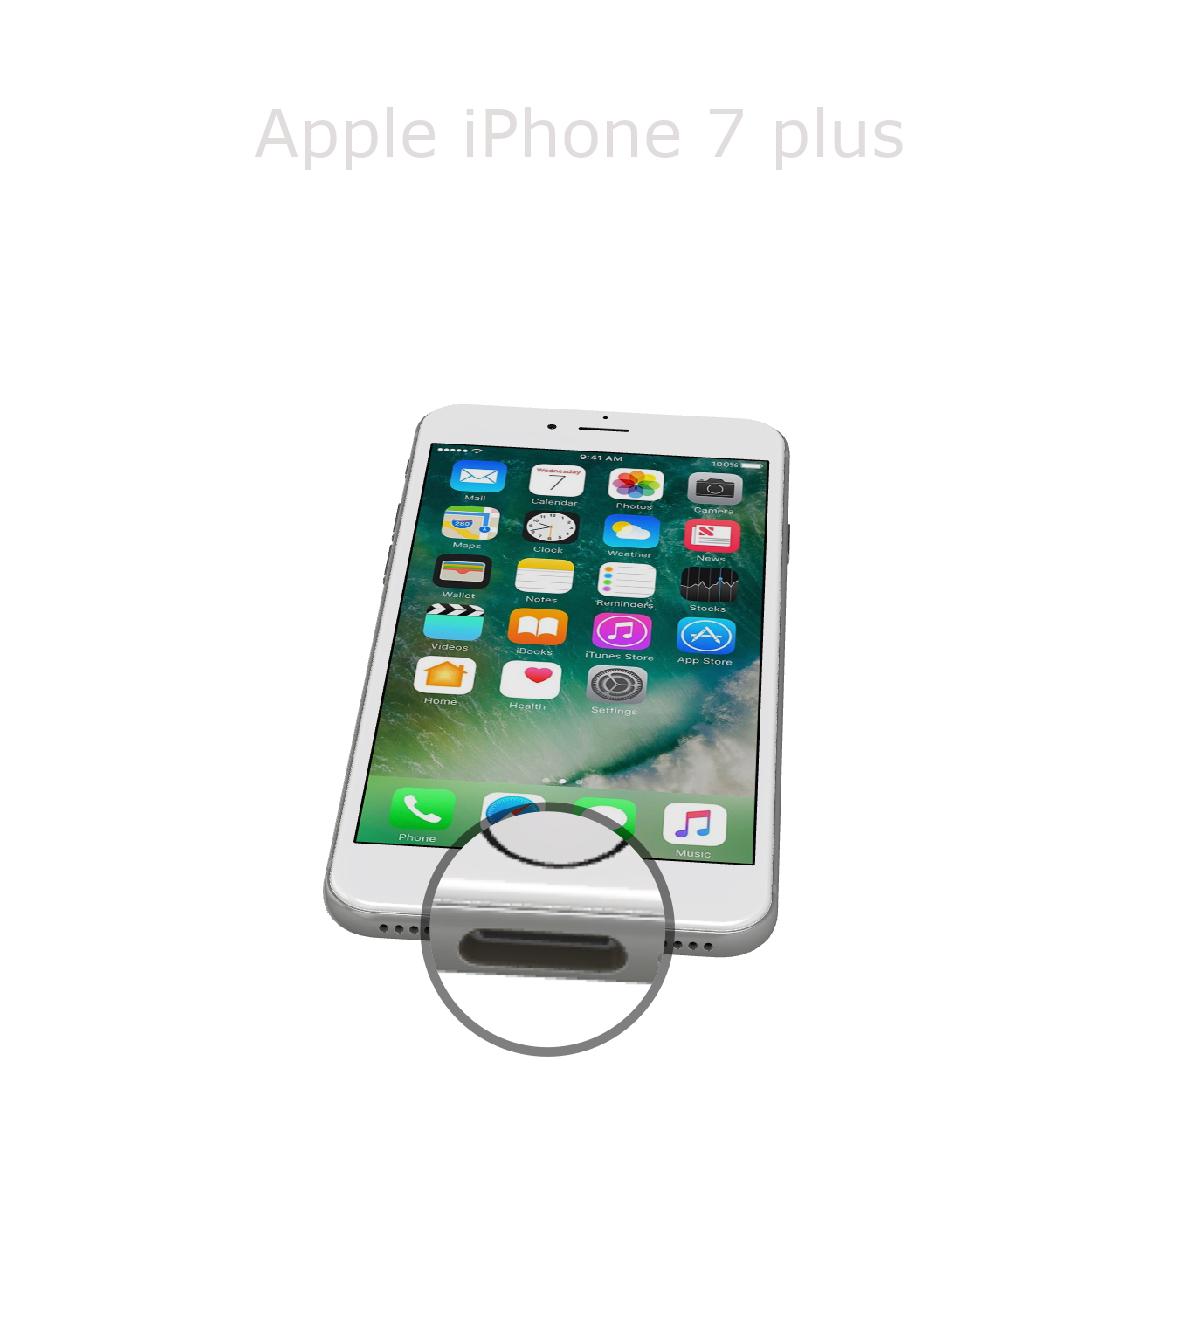 Laga lightningkontakt iPhone 7 plus